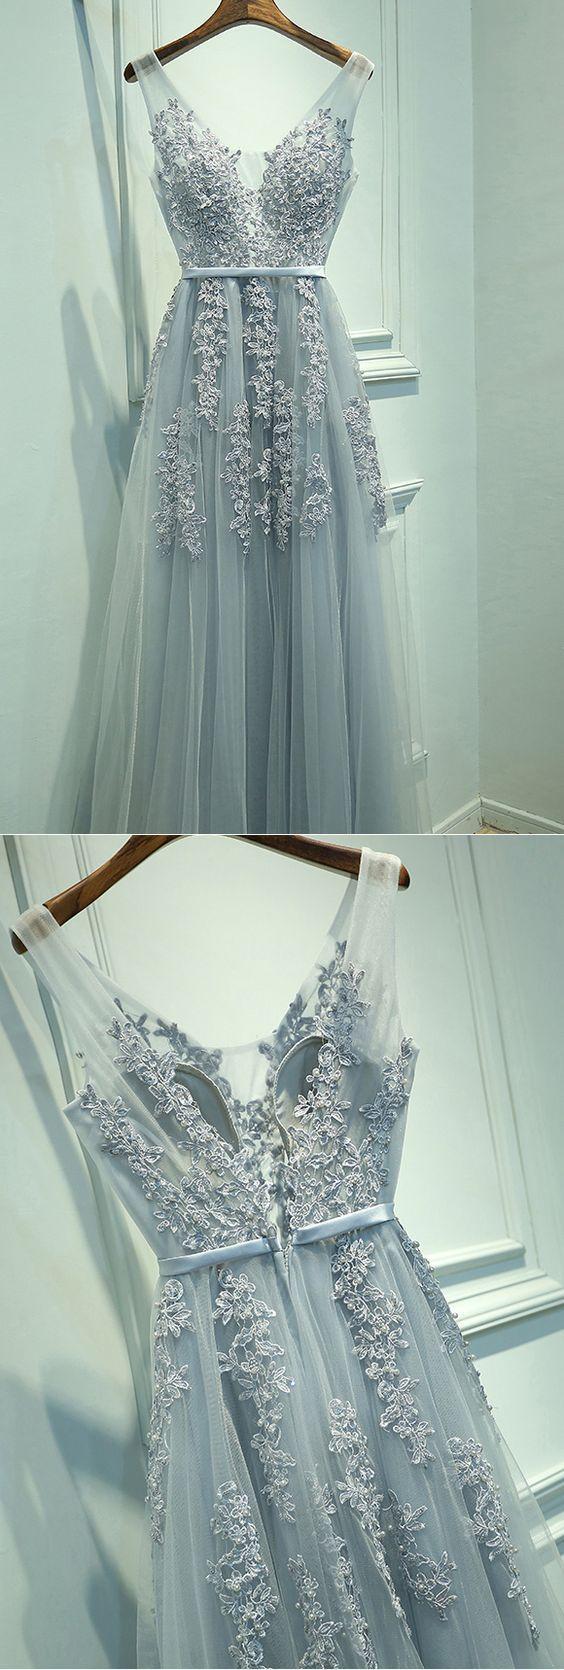 Vneck evening dresses a line formal dresses applique prom dress